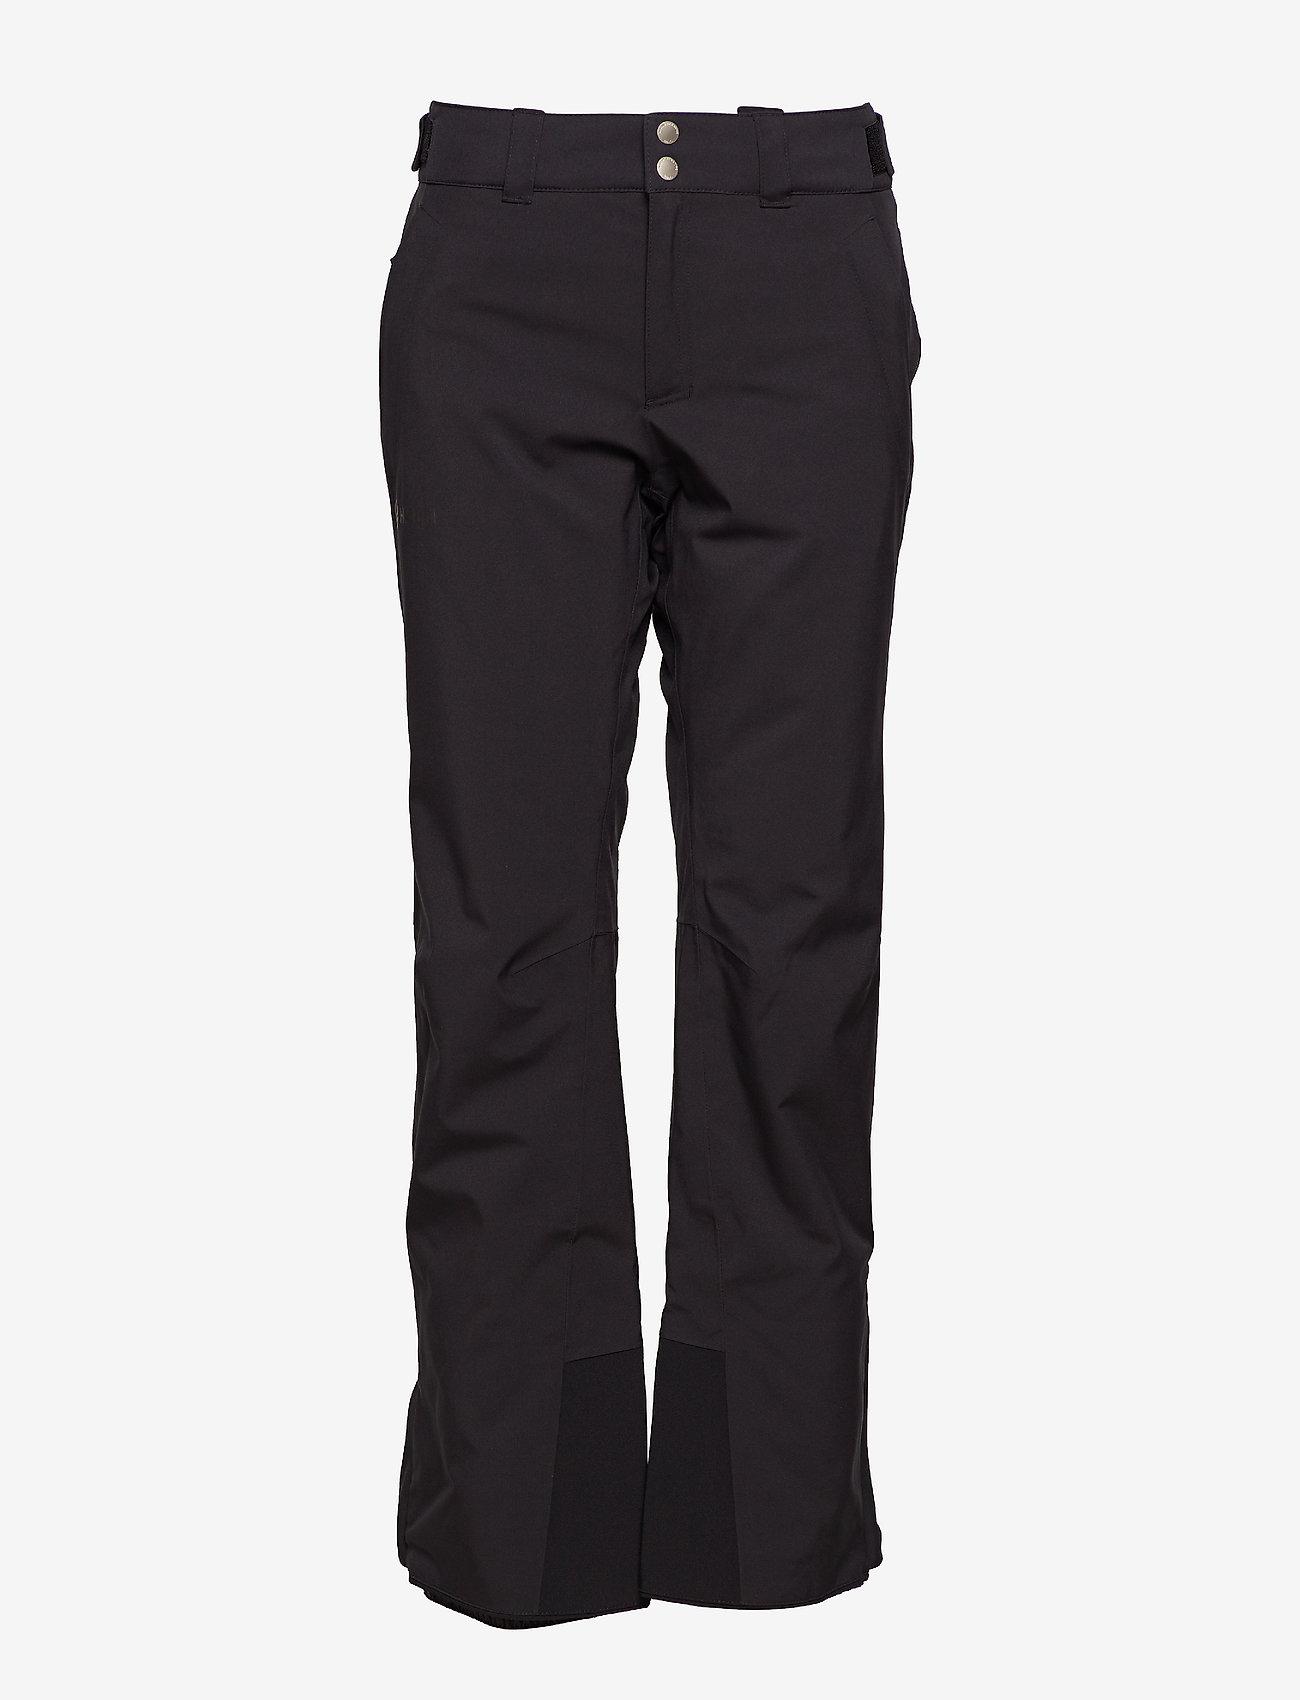 Halti - Puntti II W DX ski pants - insulated pants - black - 0